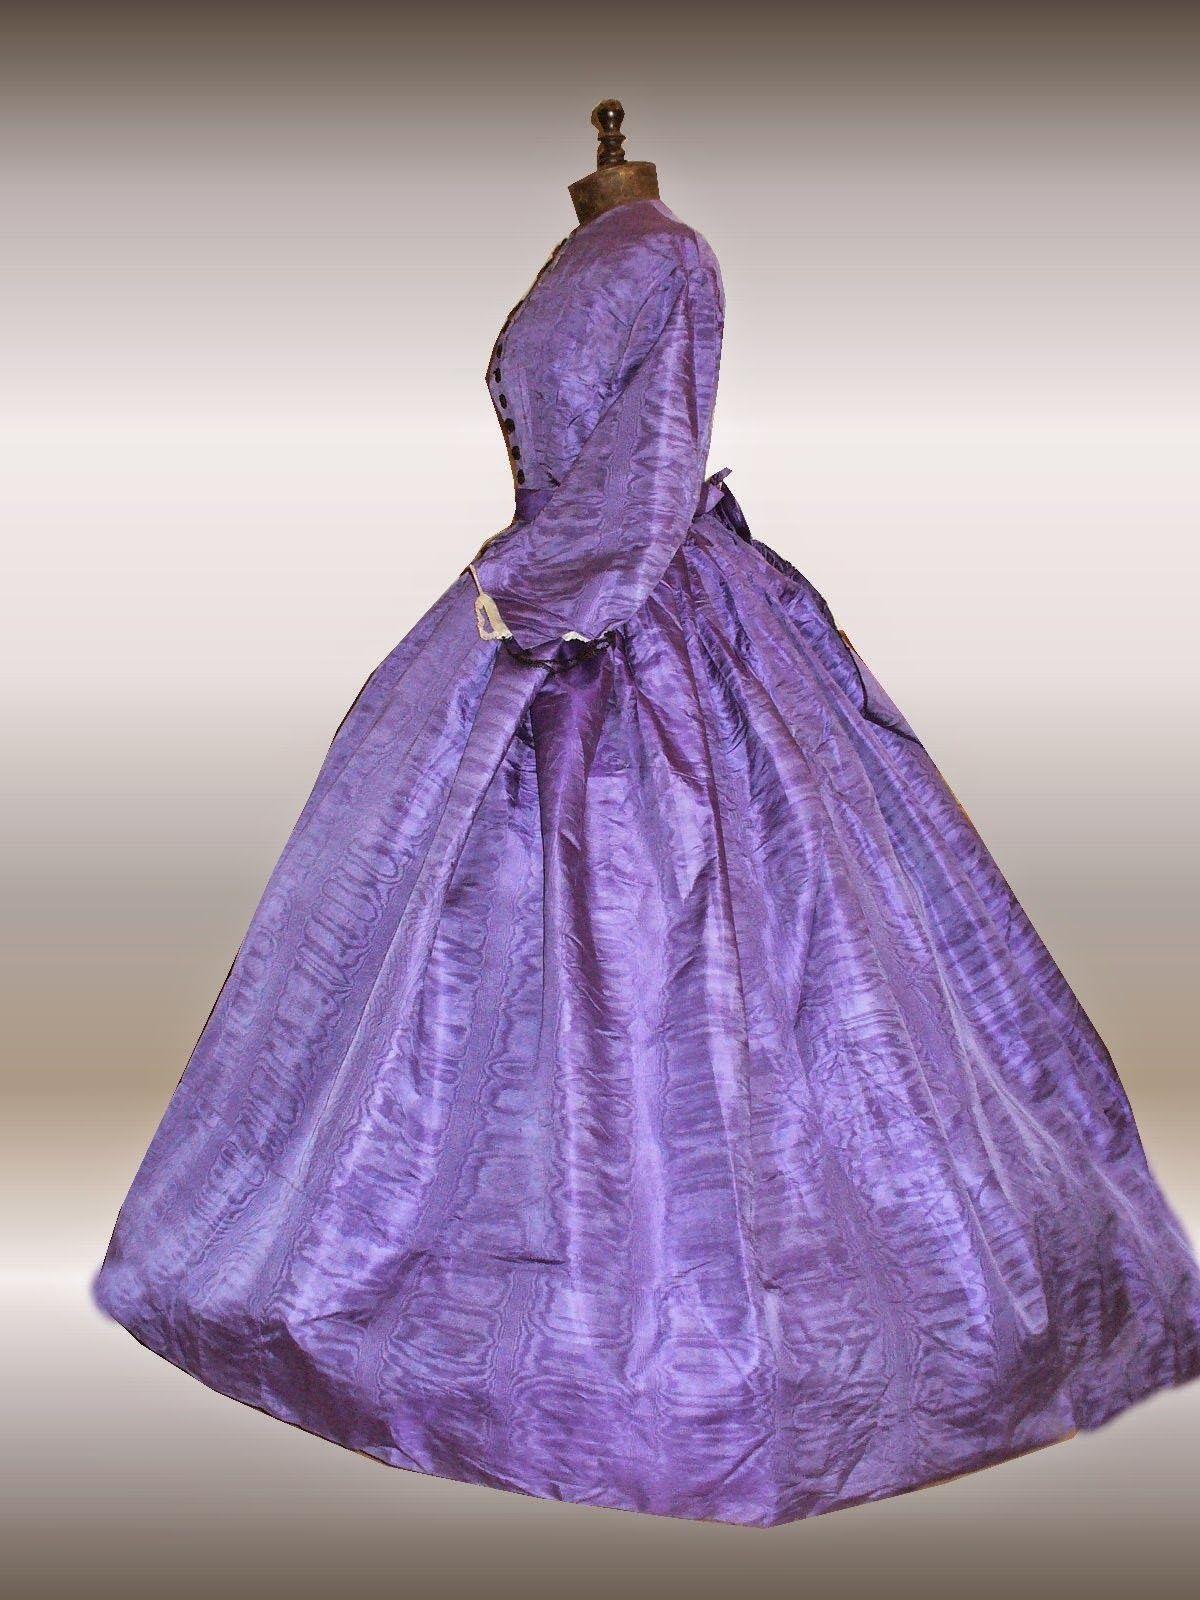 All The Pretty Dresses: 1860's Lavender Colored Dress ...